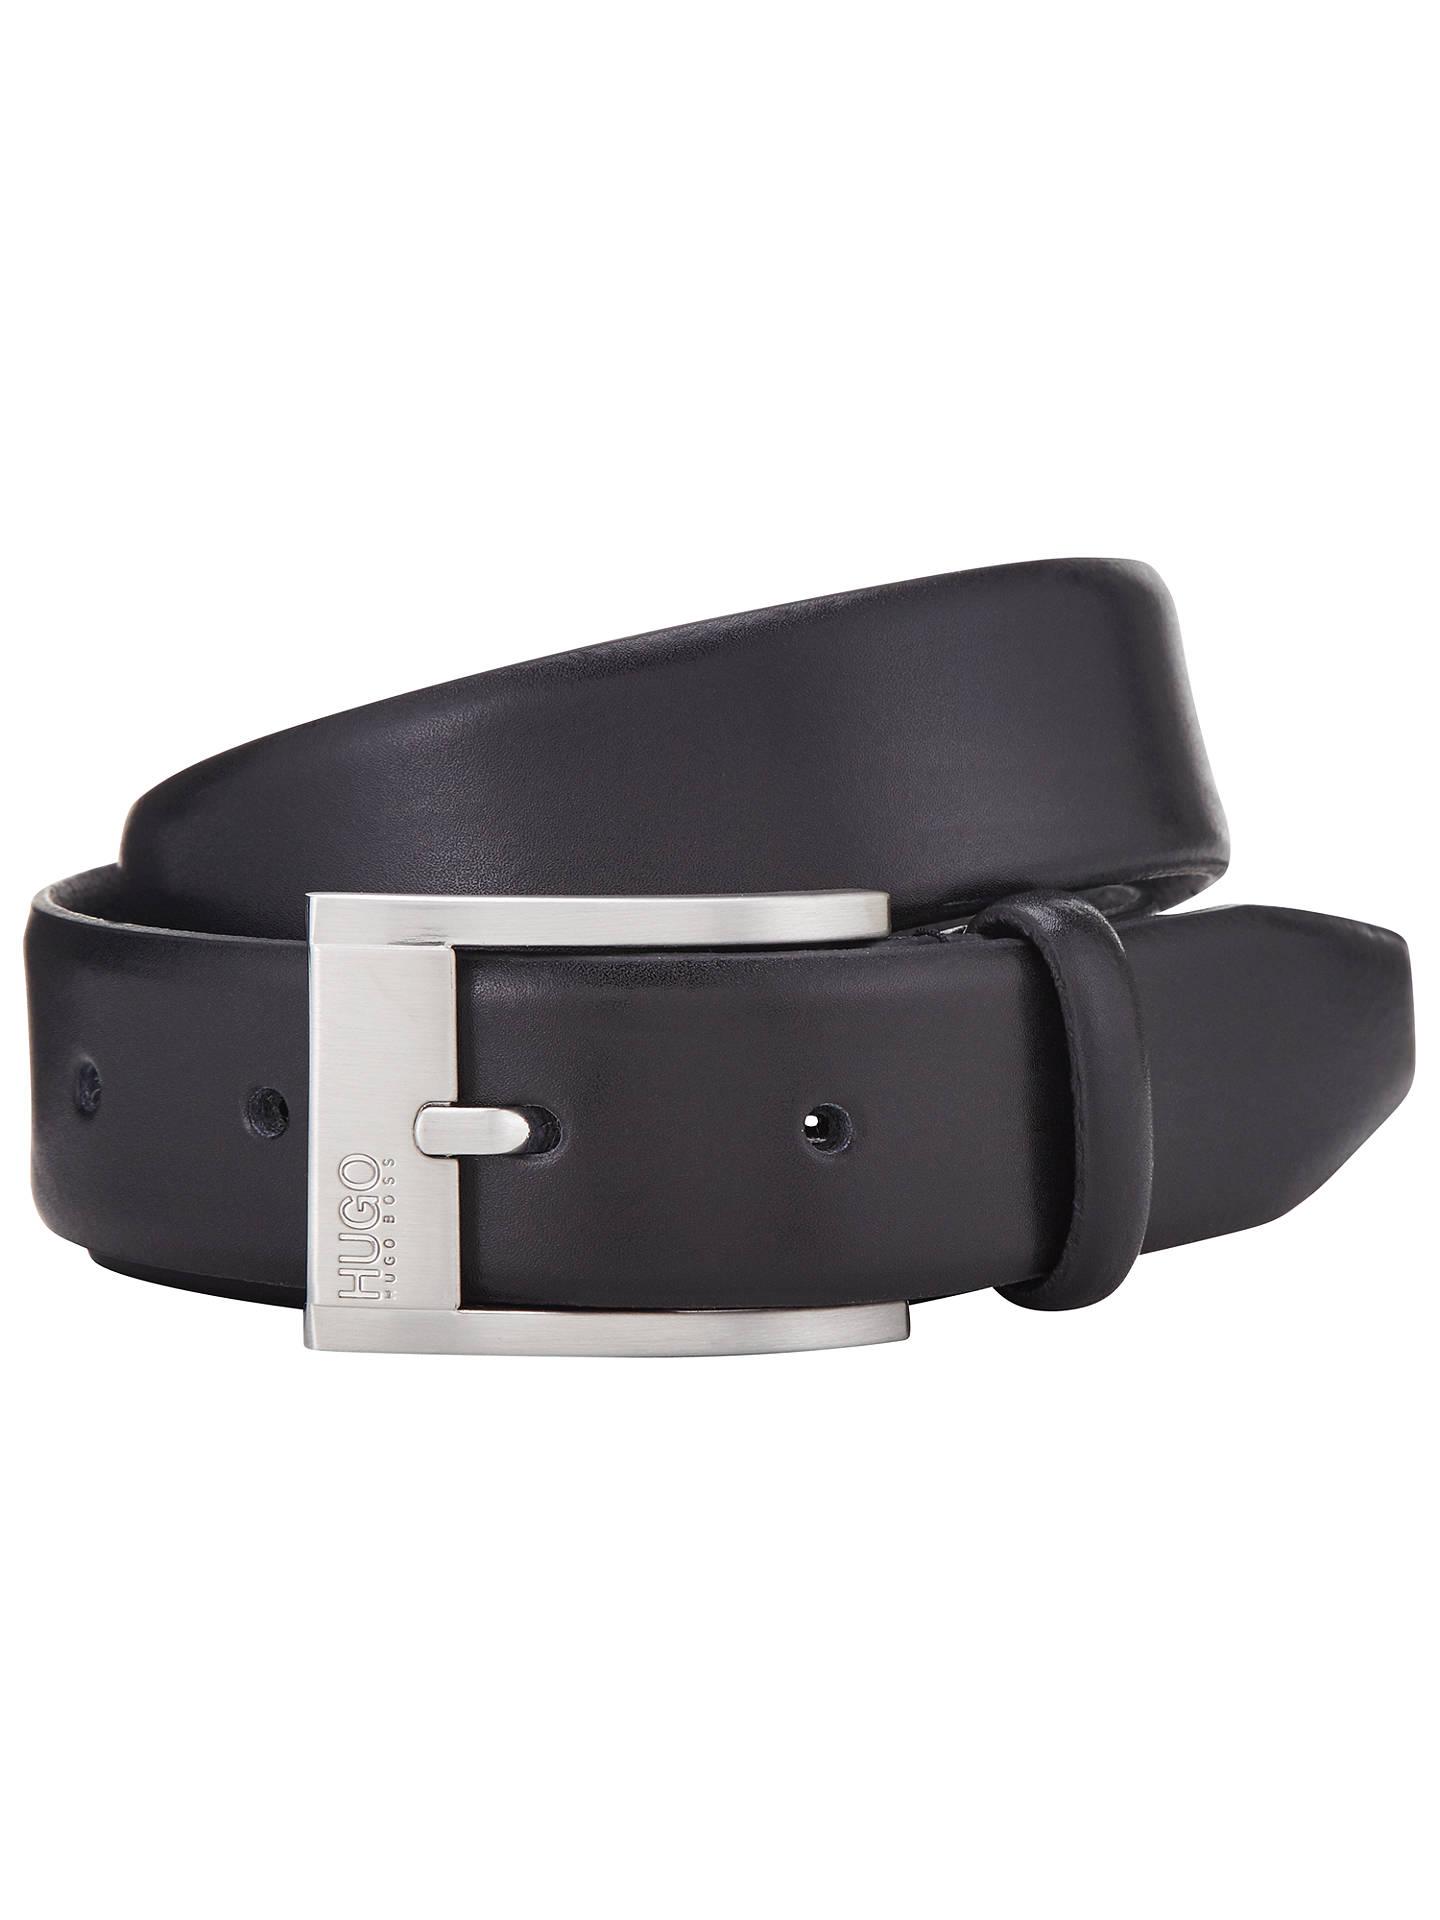 b1ca3546dc5 HUGO by Hugo Boss C-Brandon Smooth Leather Belt, Black at John Lewis ...